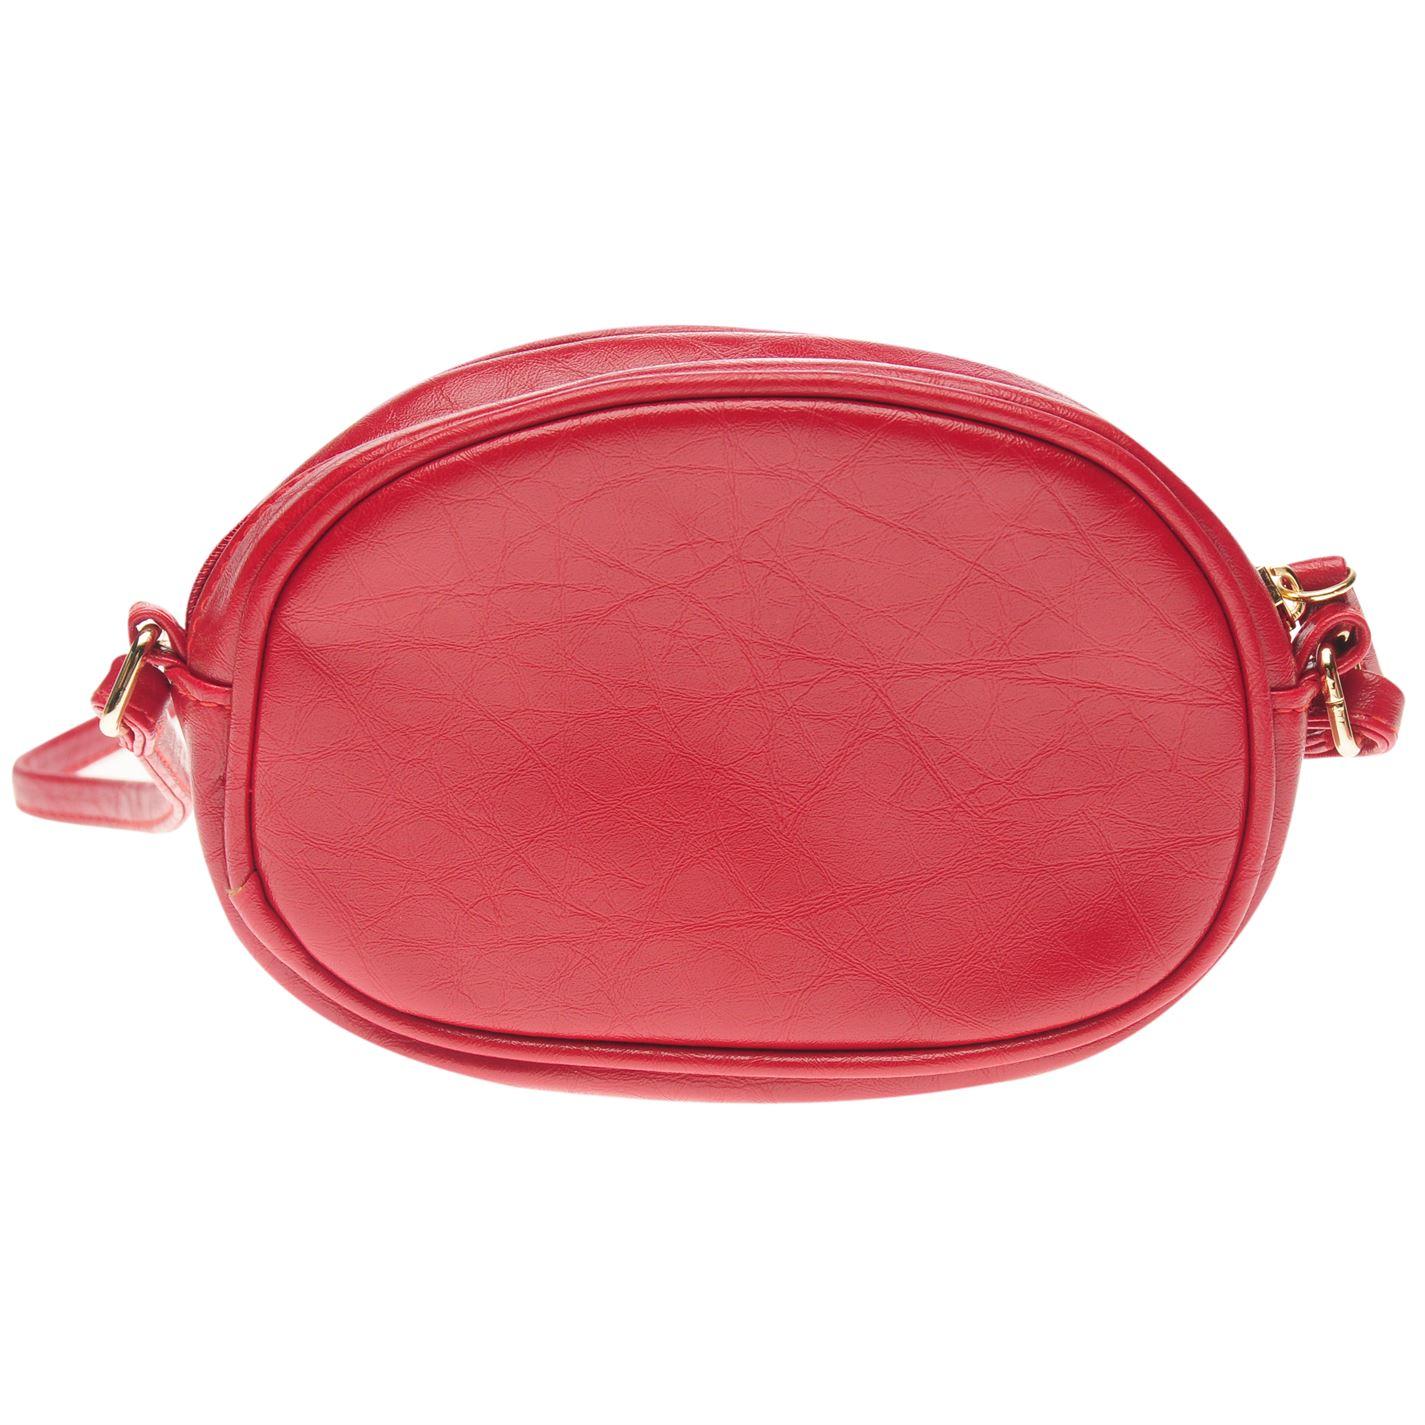 Womens-Glamorous-Lion-Shoulder-Bag-Zip-New thumbnail 10